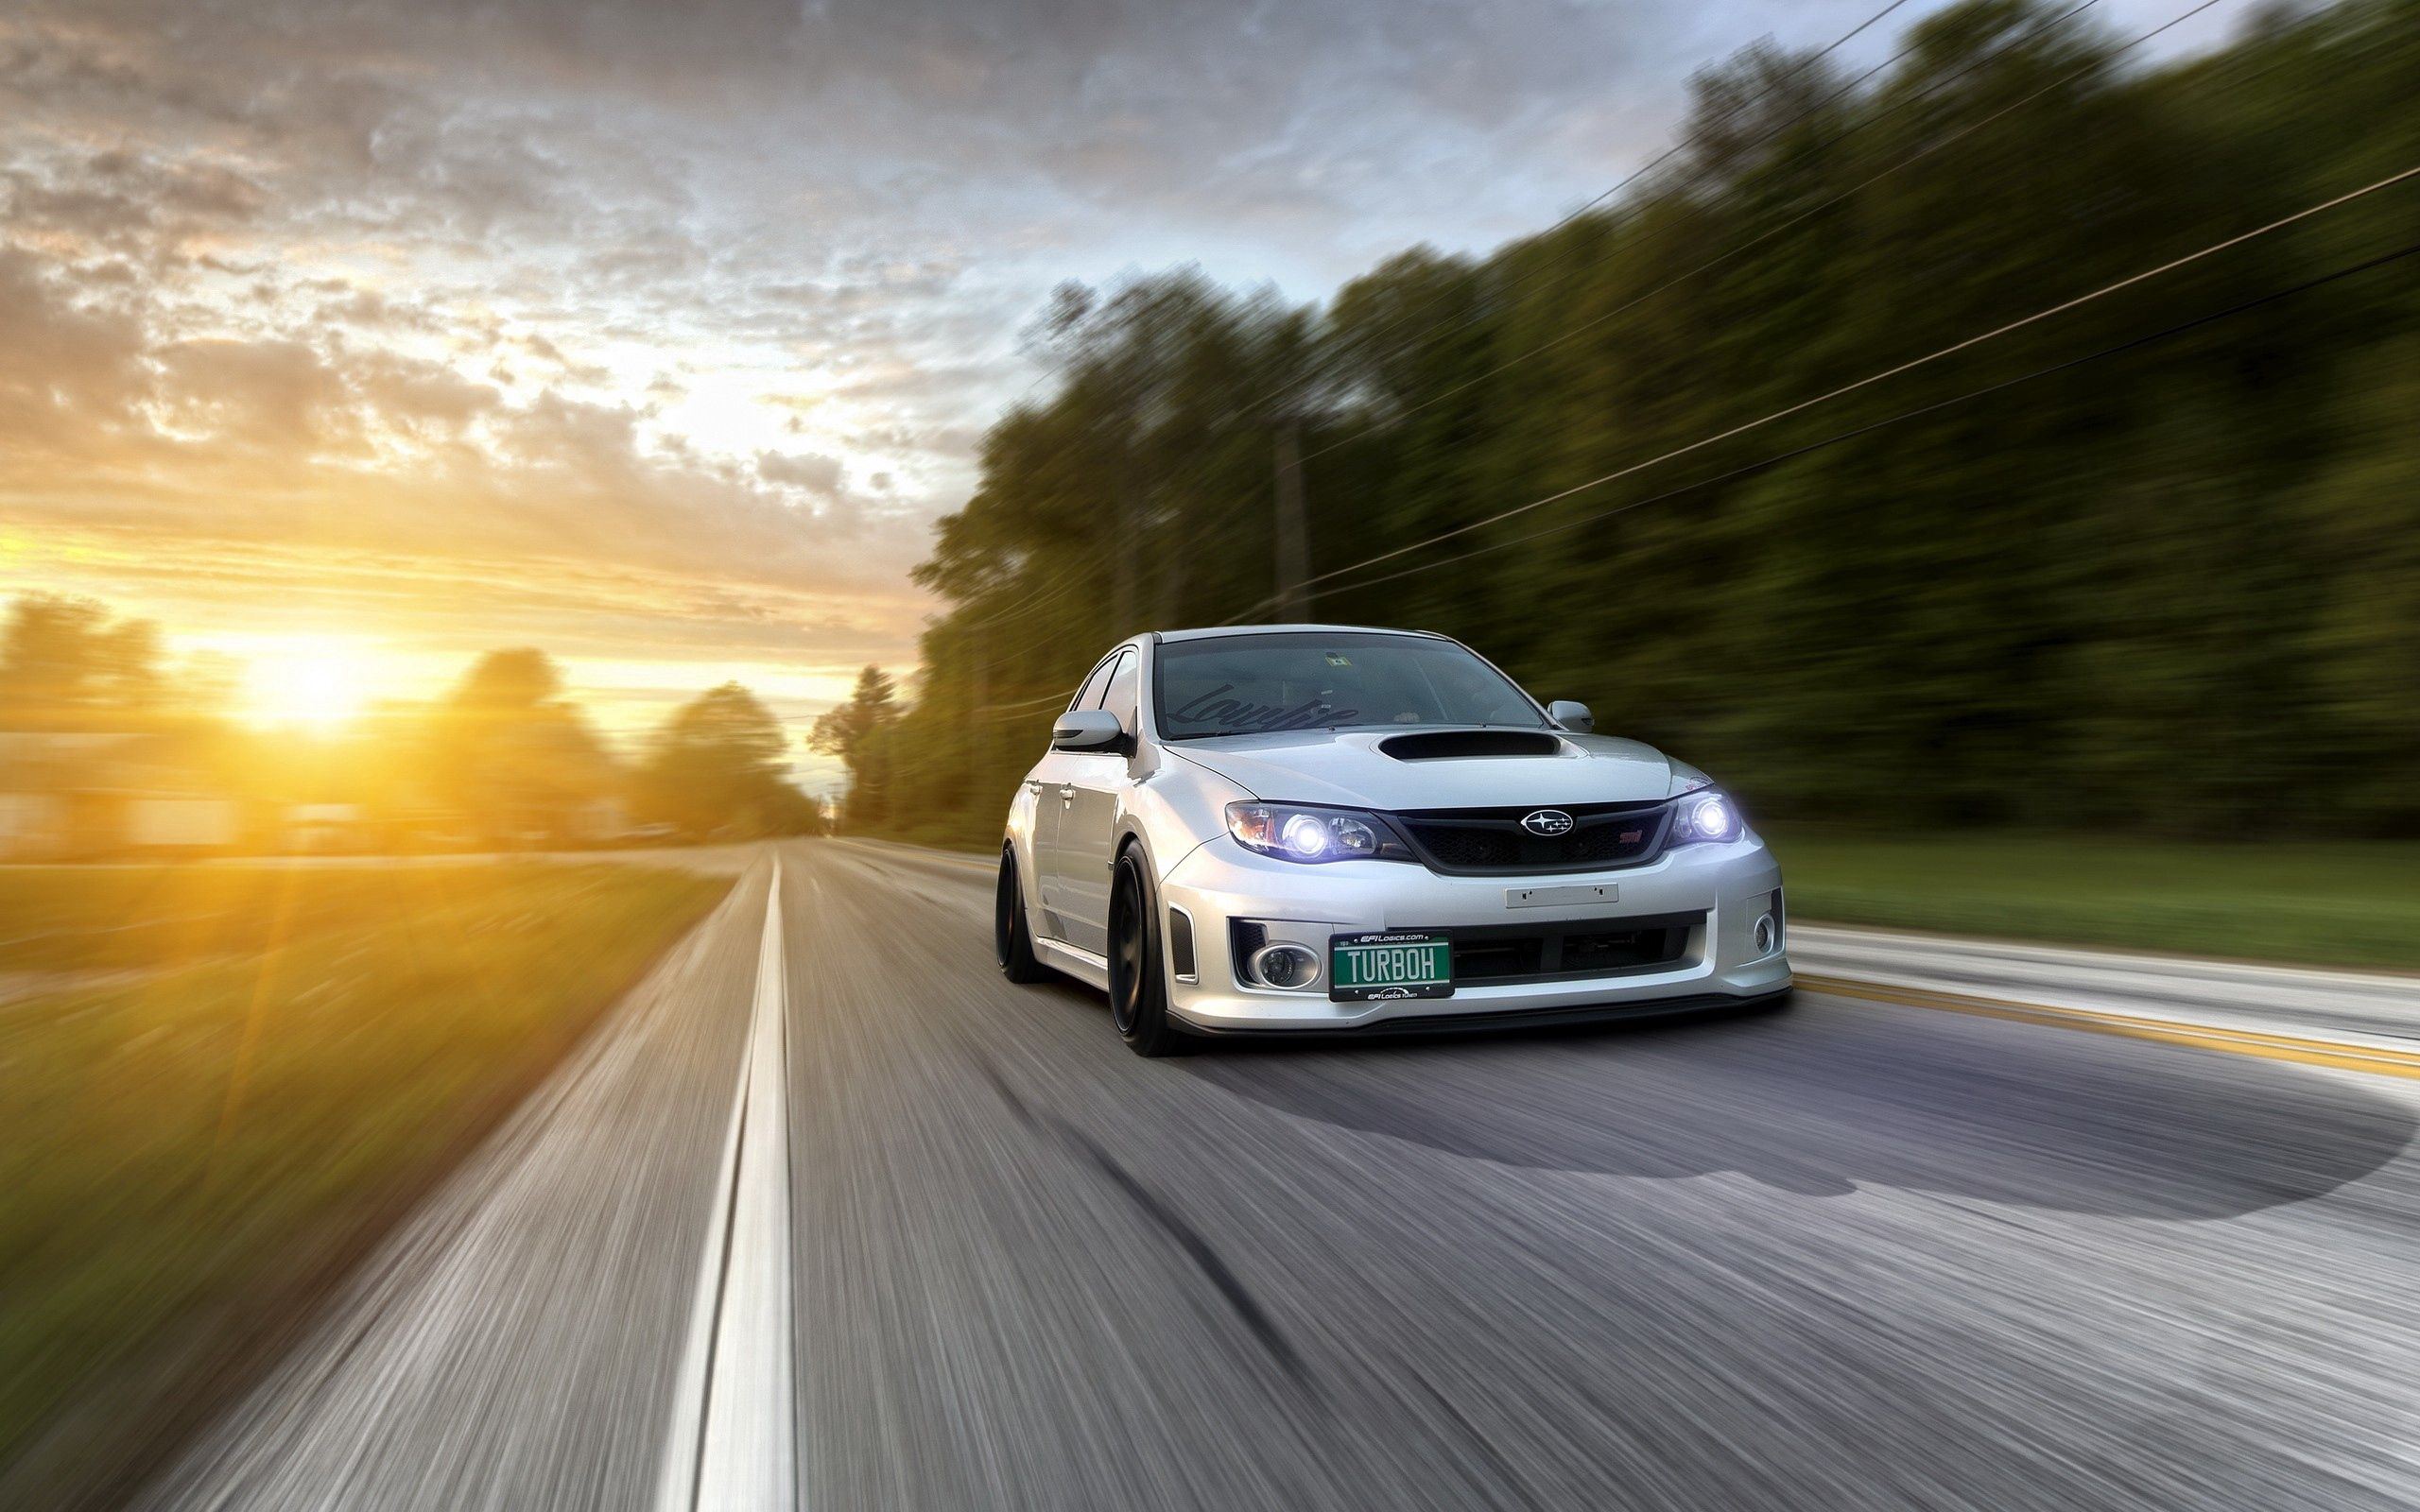 135276 descargar fondo de pantalla Coches, Subaru Impreza Wrx, Tráfico, Movimiento, Automóvil, Camino: protectores de pantalla e imágenes gratis